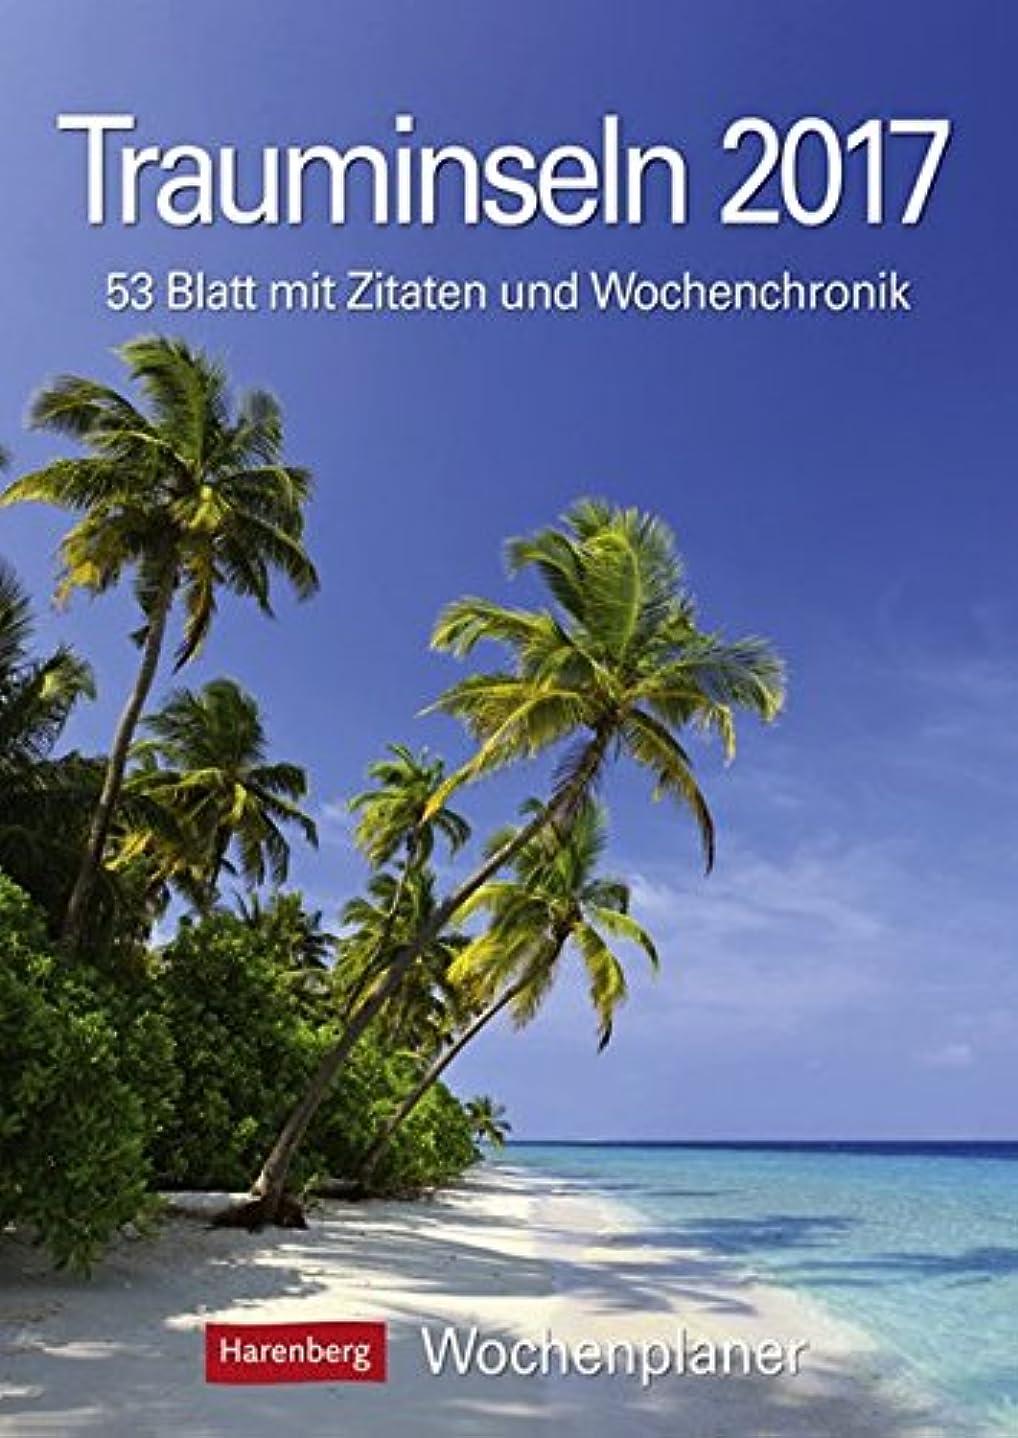 第三文明弱まるTrauminseln 2017 Wochenplaner: 53 Blatt mit Zitaten und Wochenchronik